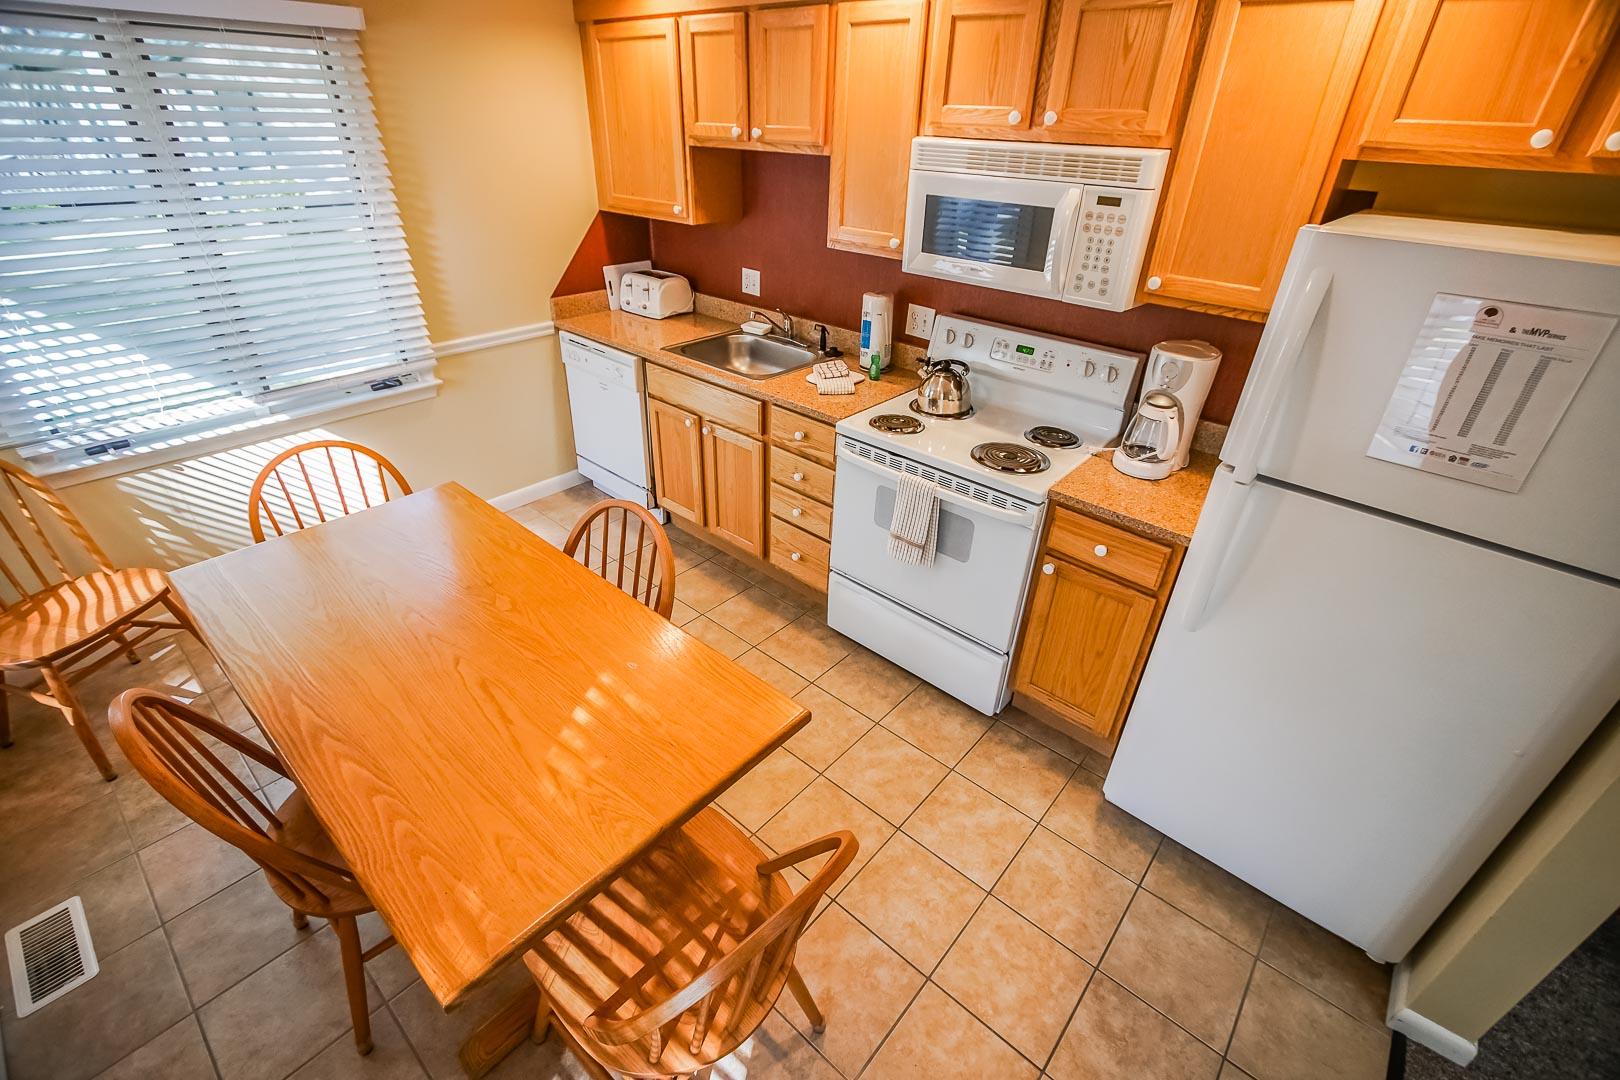 A modern full size kitchen at VRI's Cape Cod Holiday Estates in Massachusetts.